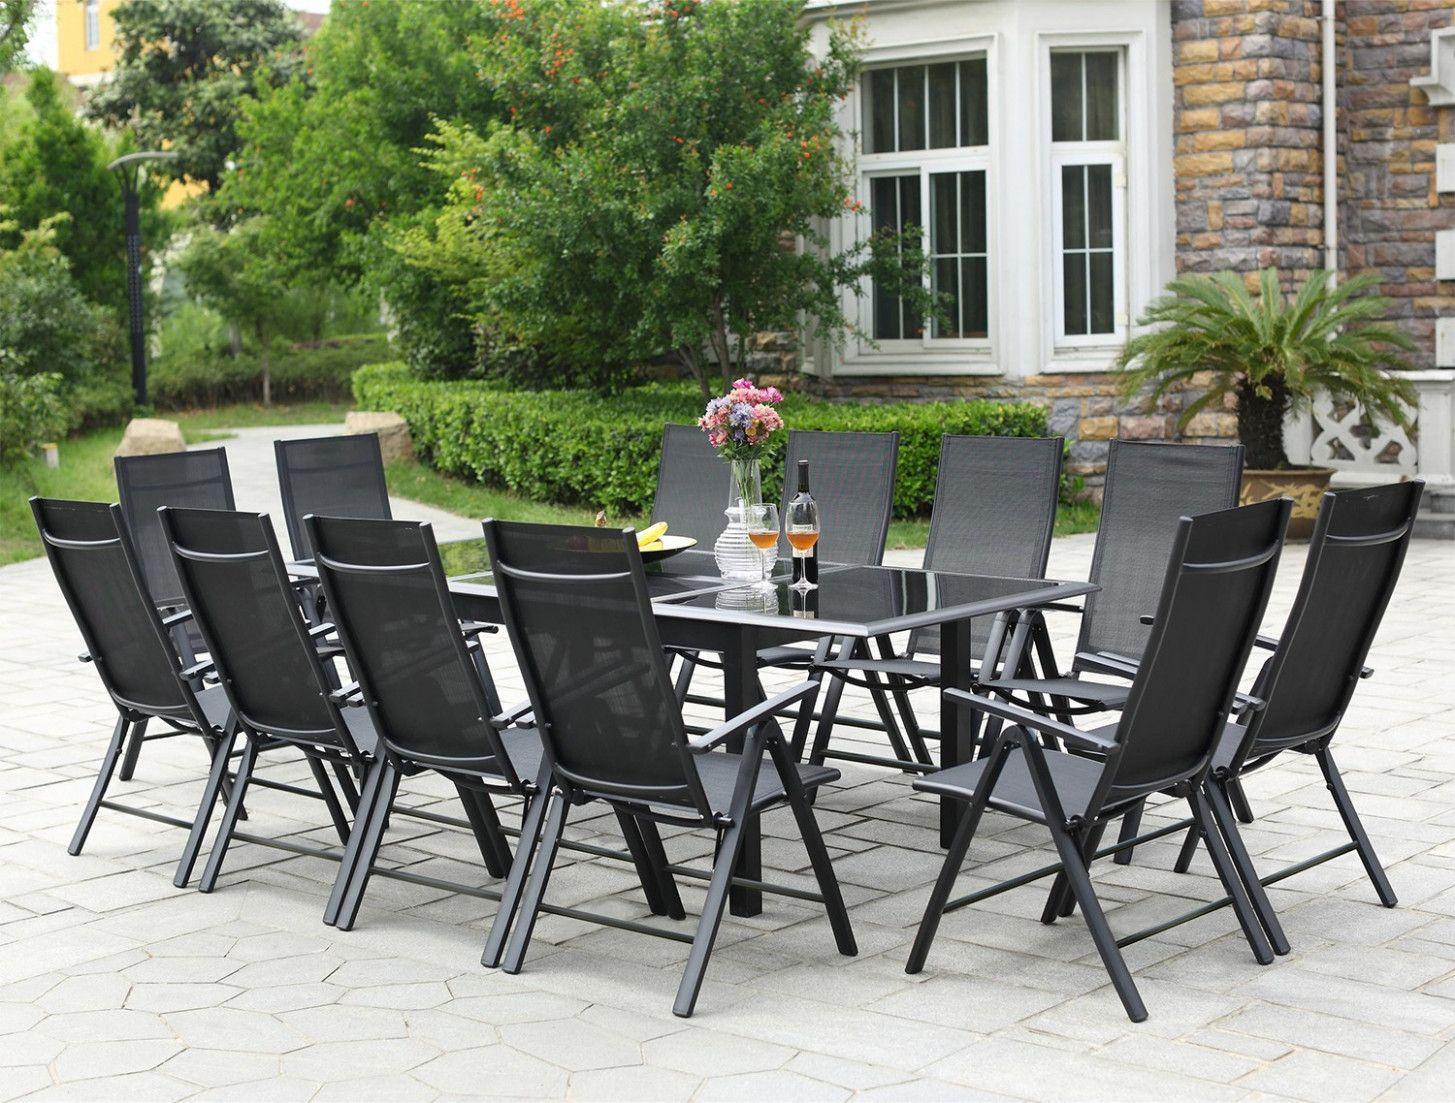 Salon De Jardin Bricomarche Check More At Https Www Epalumni Com Salon De Jardin Bricomarch C3 A9 Outdoor Decor Outdoor Furniture Sets Outdoor Chairs